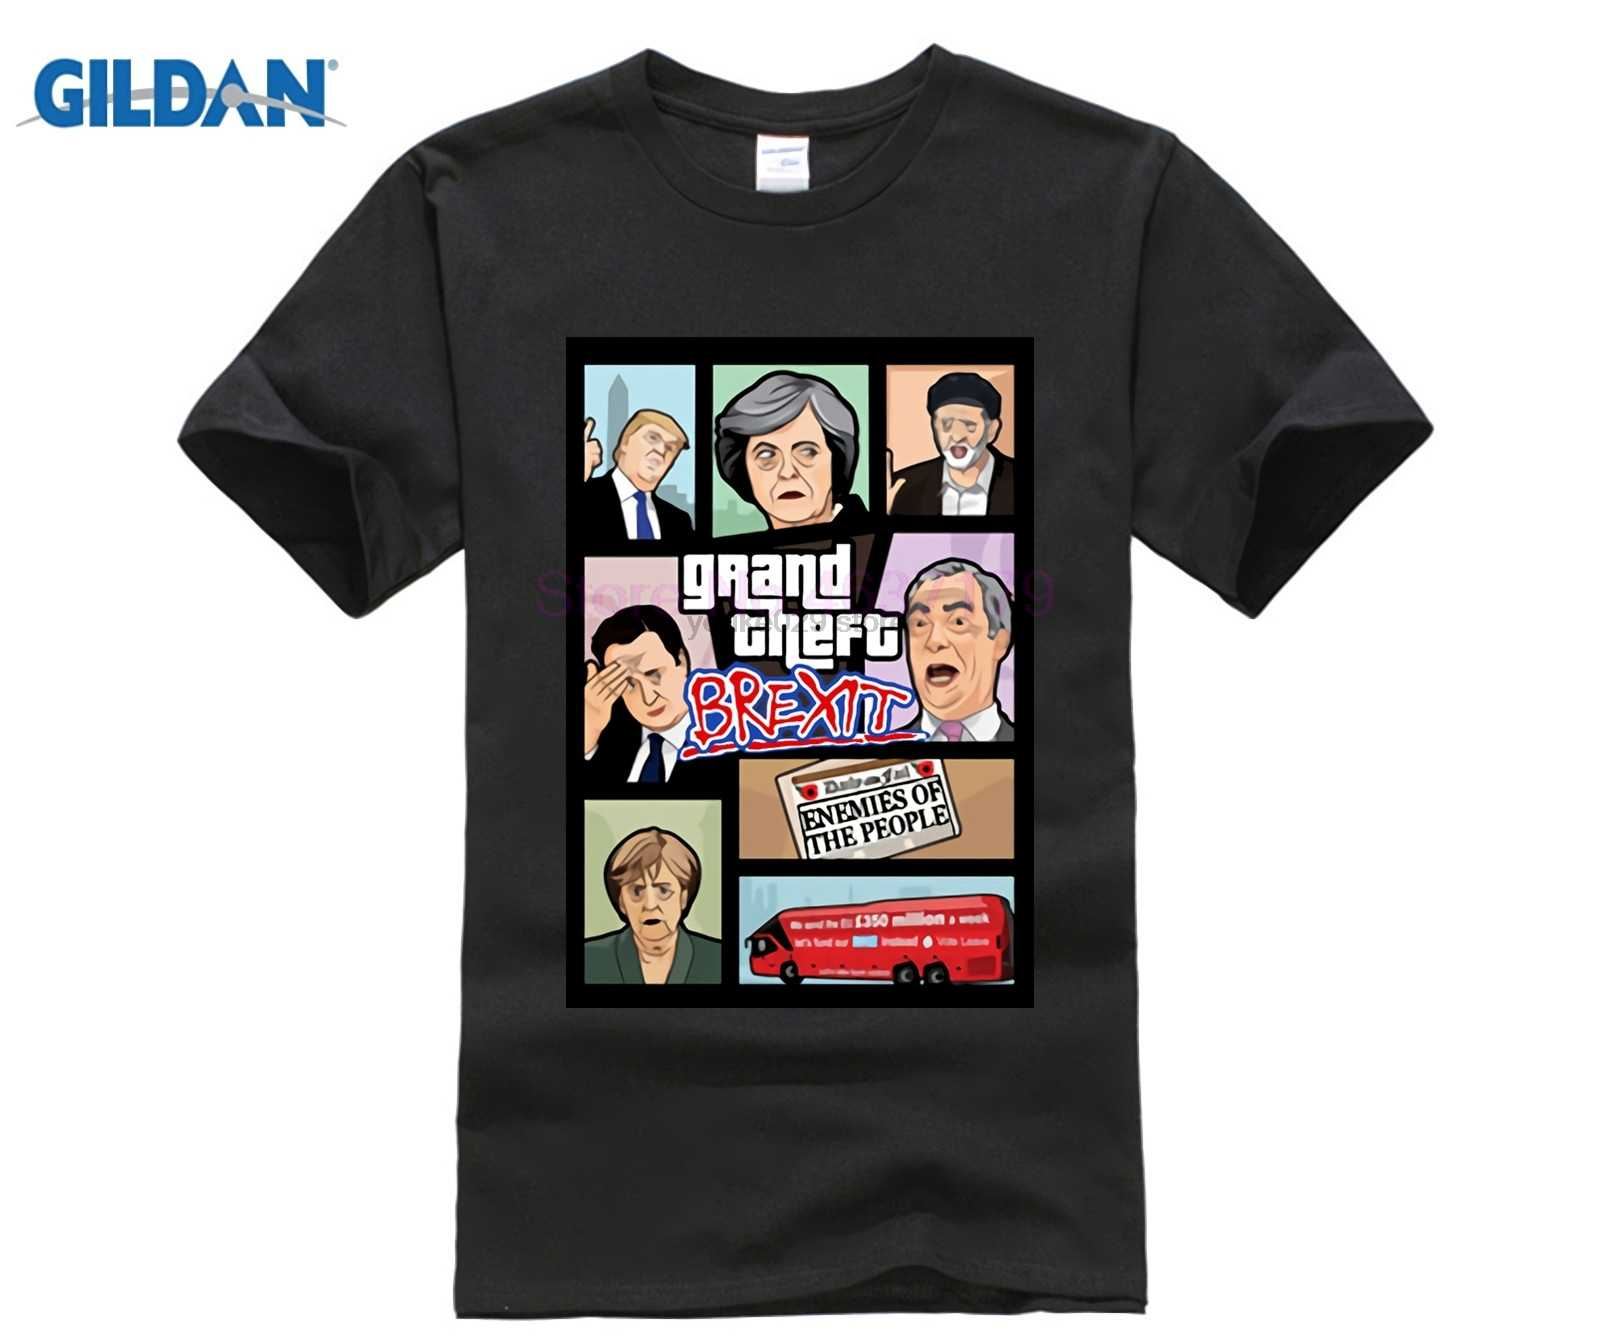 Grand Theft Auto 3D мужская футболка GTA 5 Футболка смешная видео игра Brexit Британия Меркель